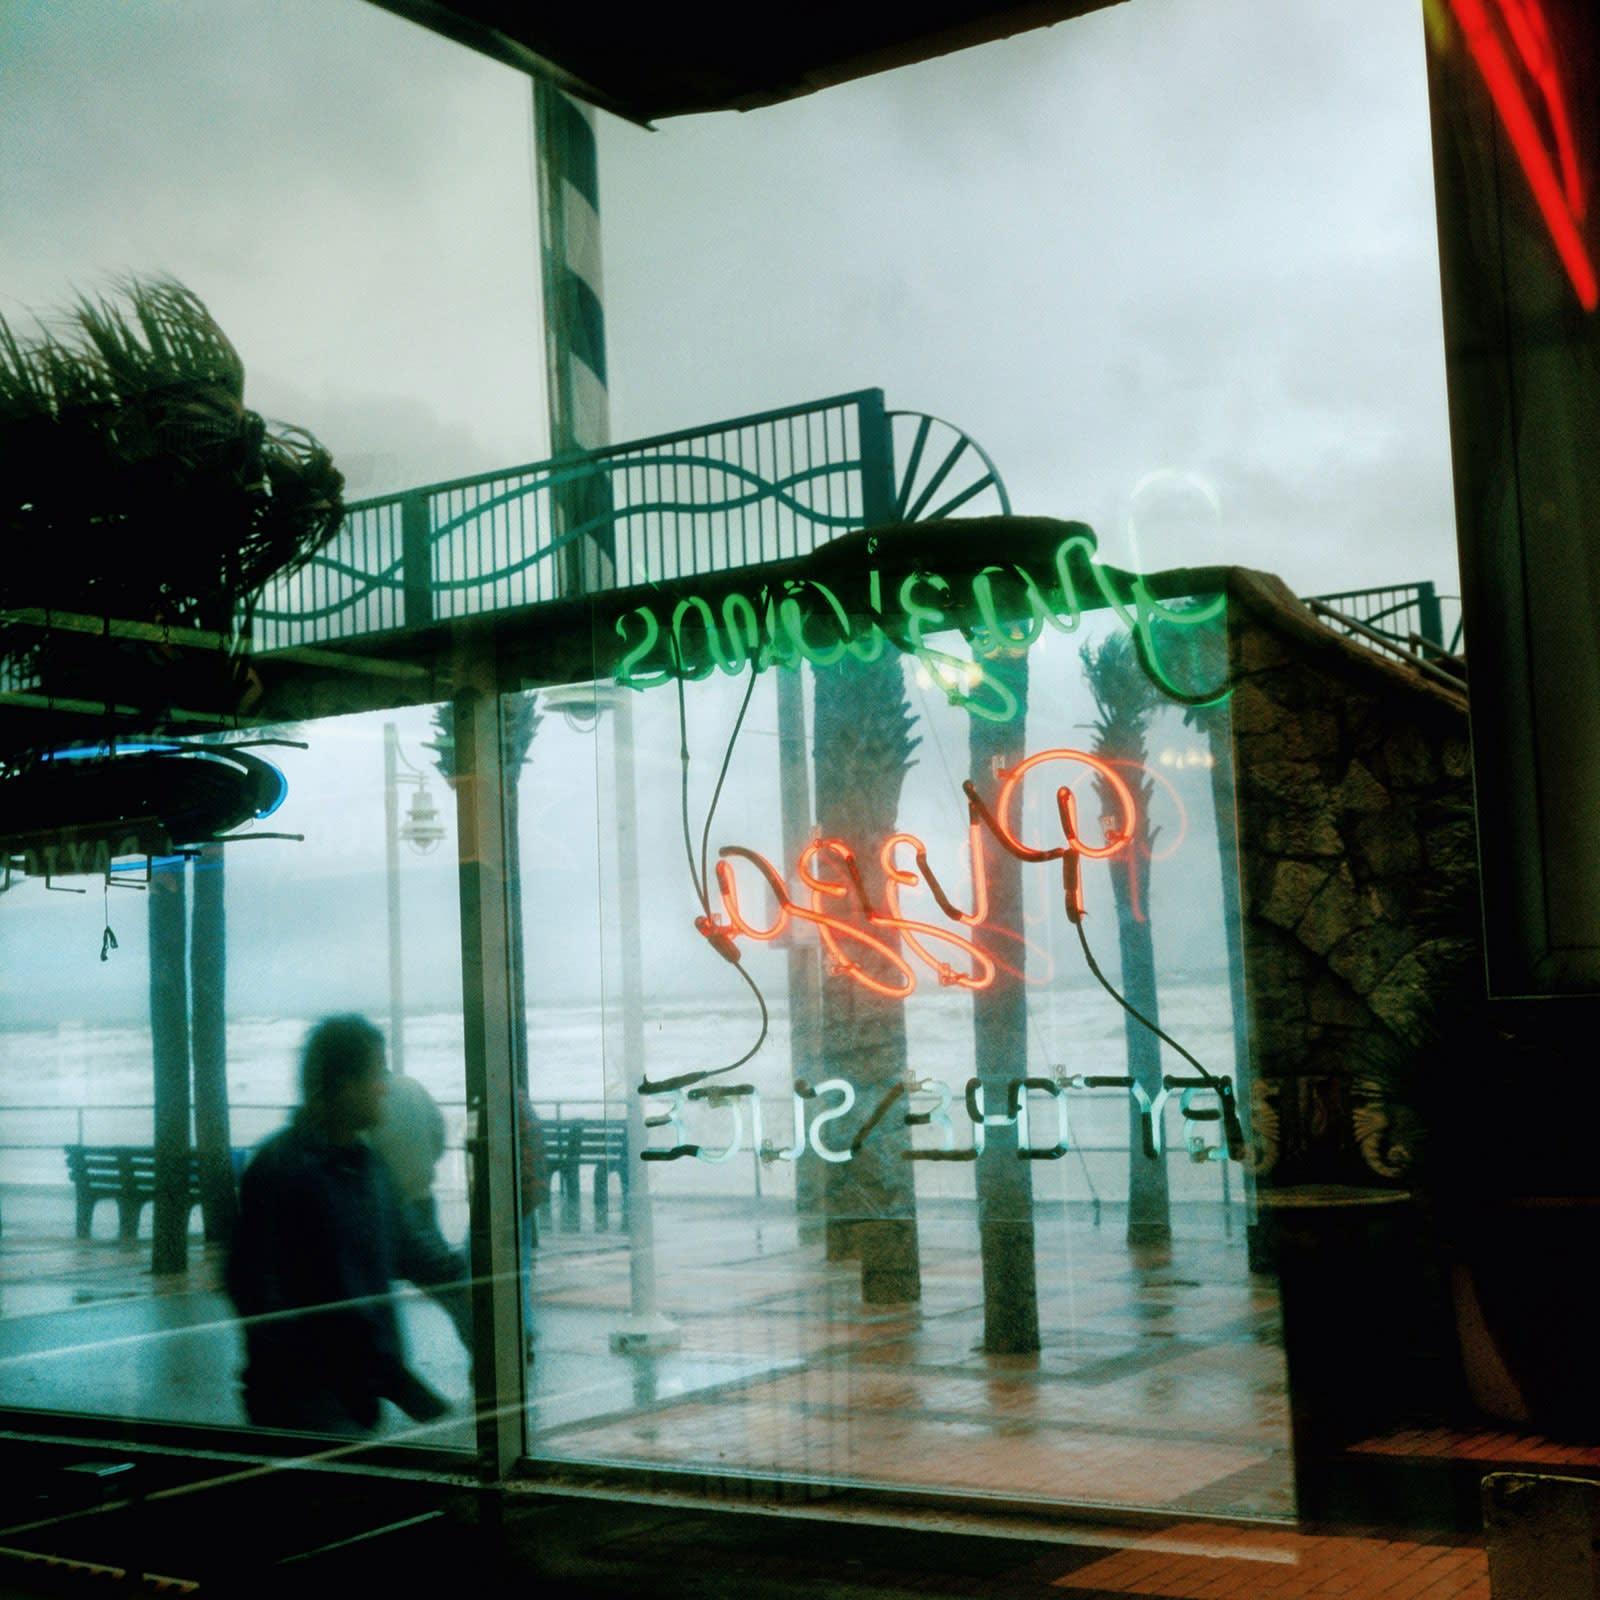 Jean-Christophe Béchet Daytona Beach, Floride #199 Tirage Ilfochrome (Cibachrome) Dim. papier: 40 x 50 cm